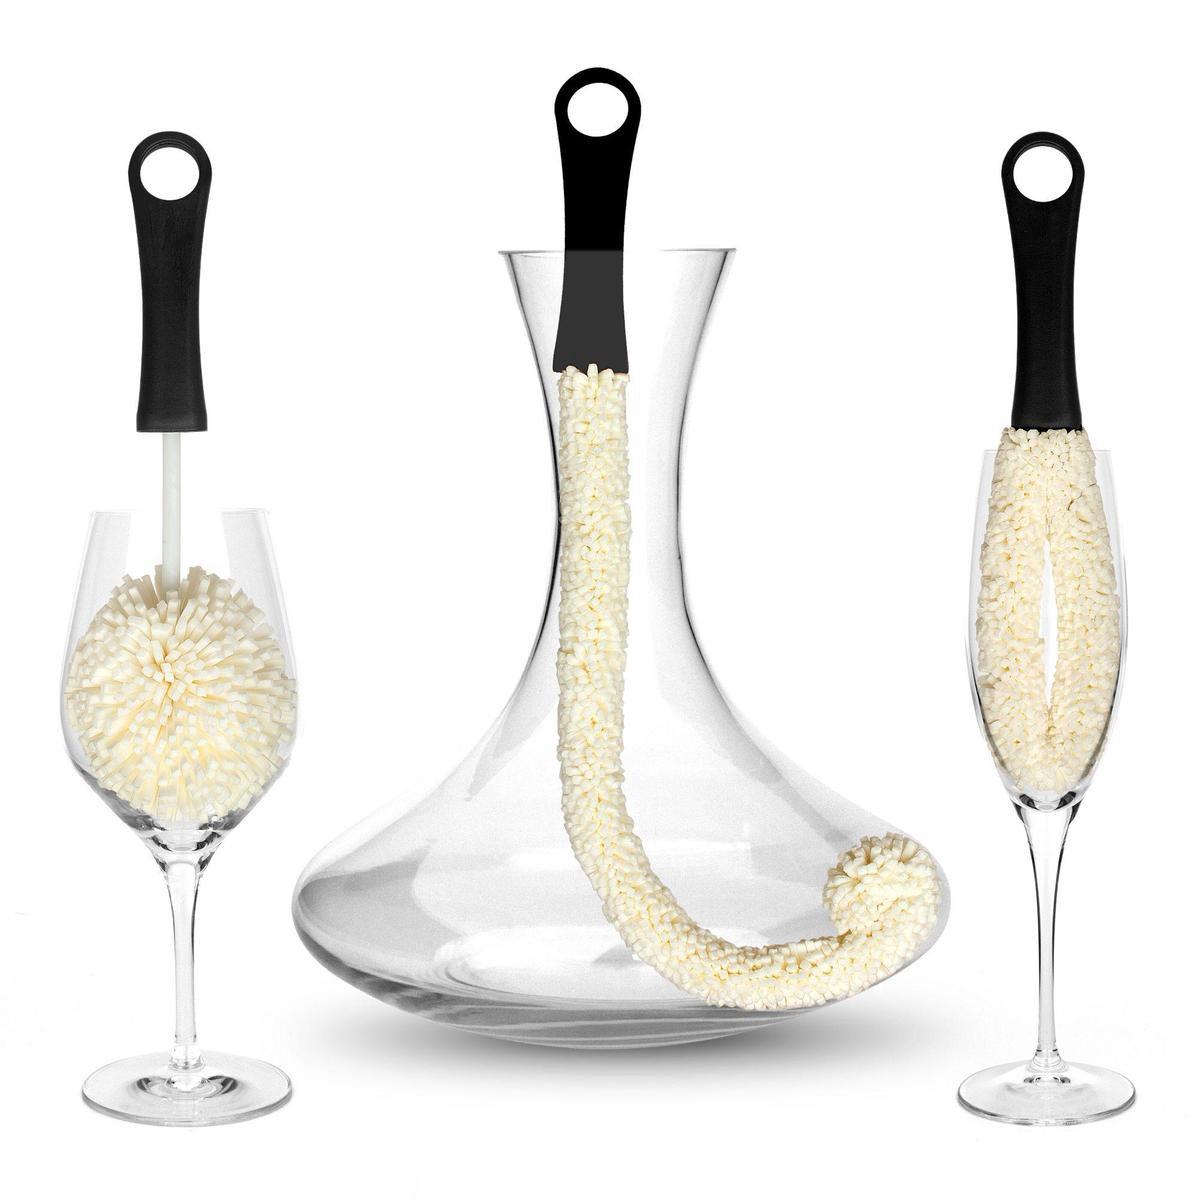 Bar Amigos - Decanter Cleaner / Reiniger - Karaf Borstel set van 3